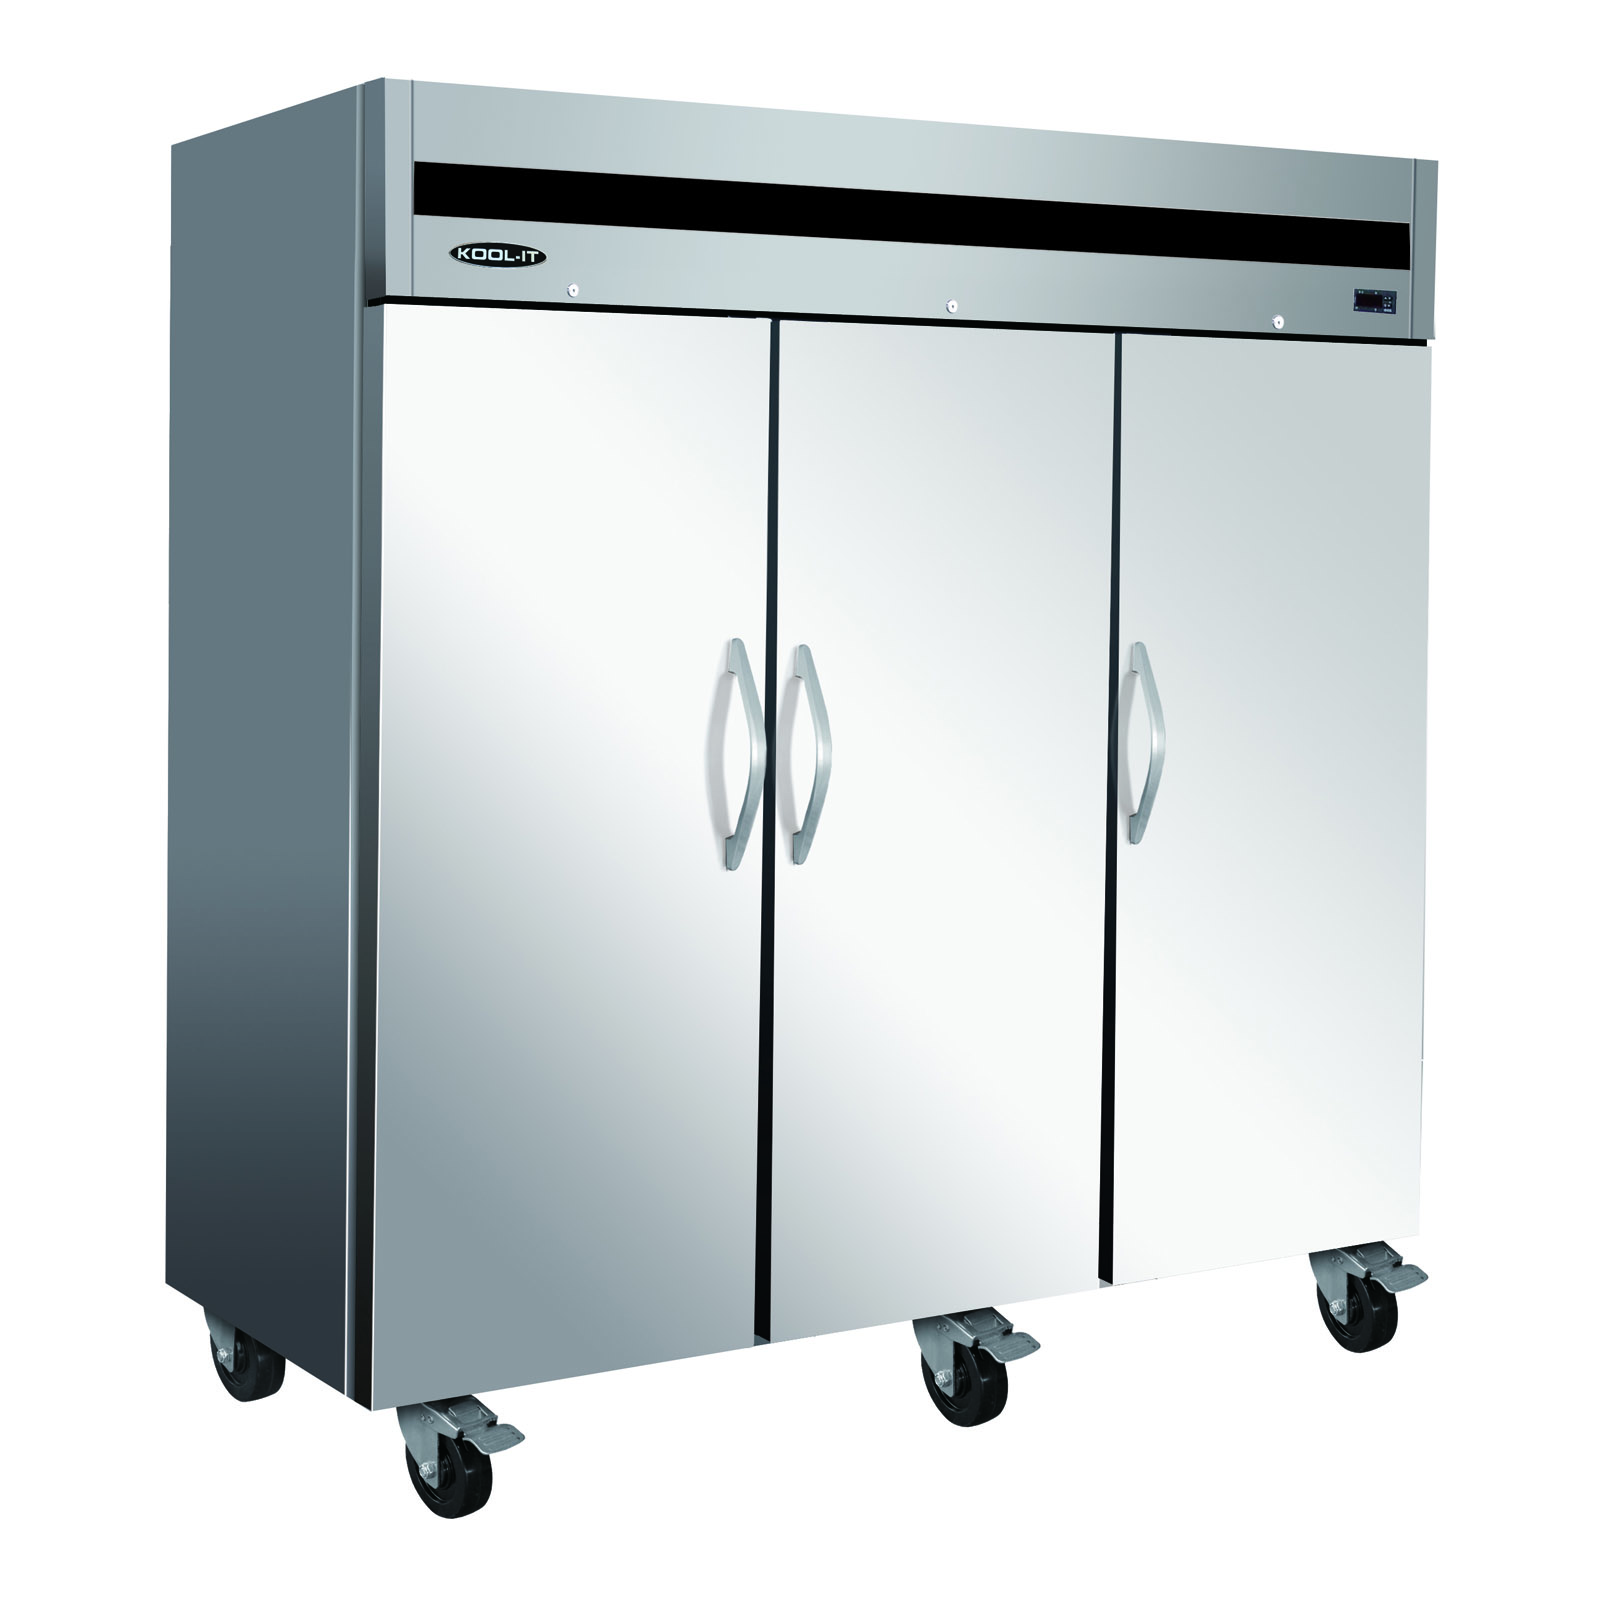 MVP IT82R refrigerator, reach-in